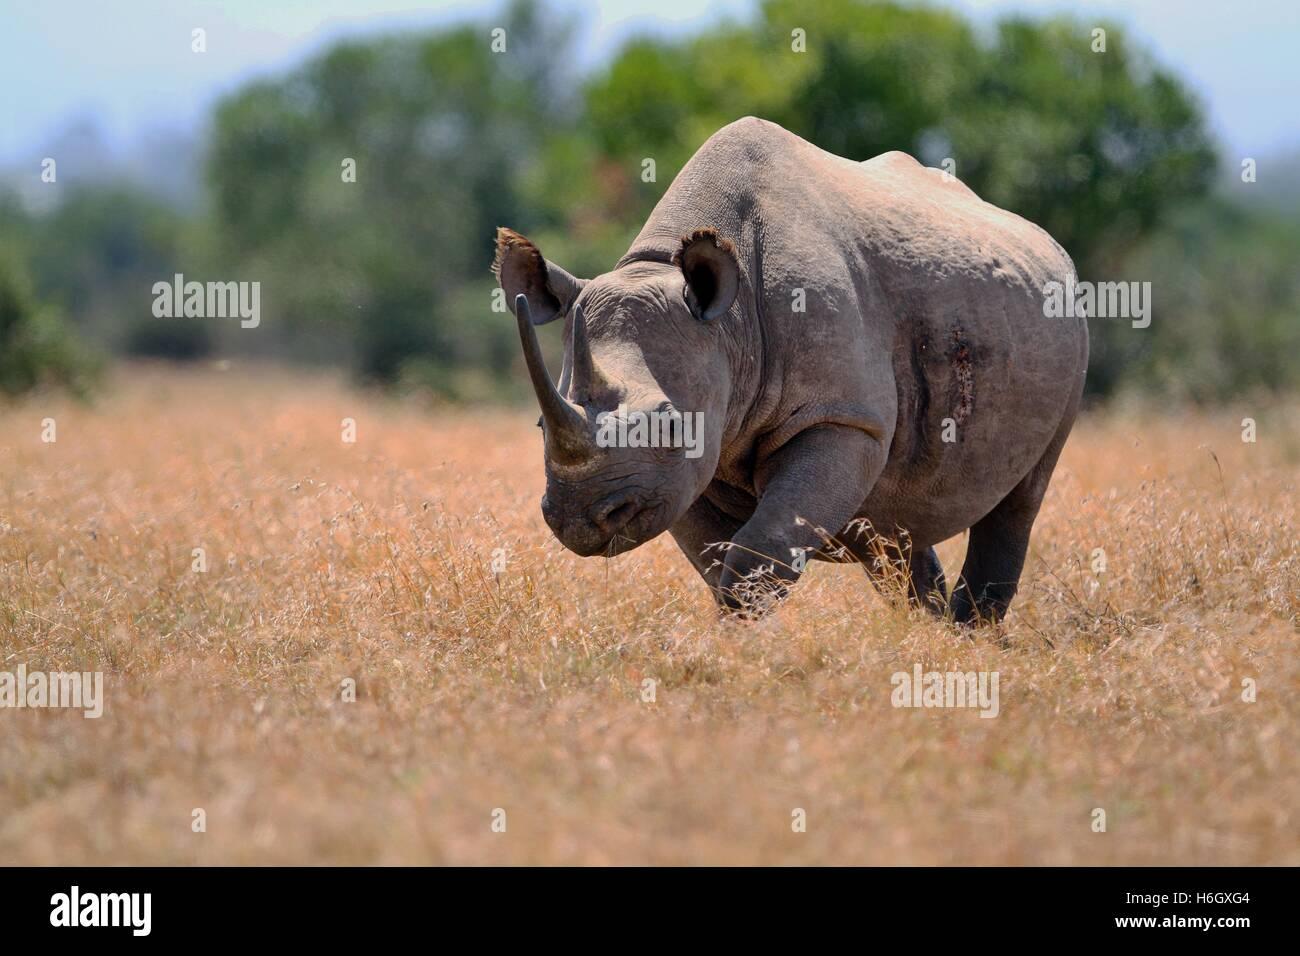 Male White Rhino walking through dry grass at Ol Pajeta Conservancy, Nanyuki, Kenya - Stock Image